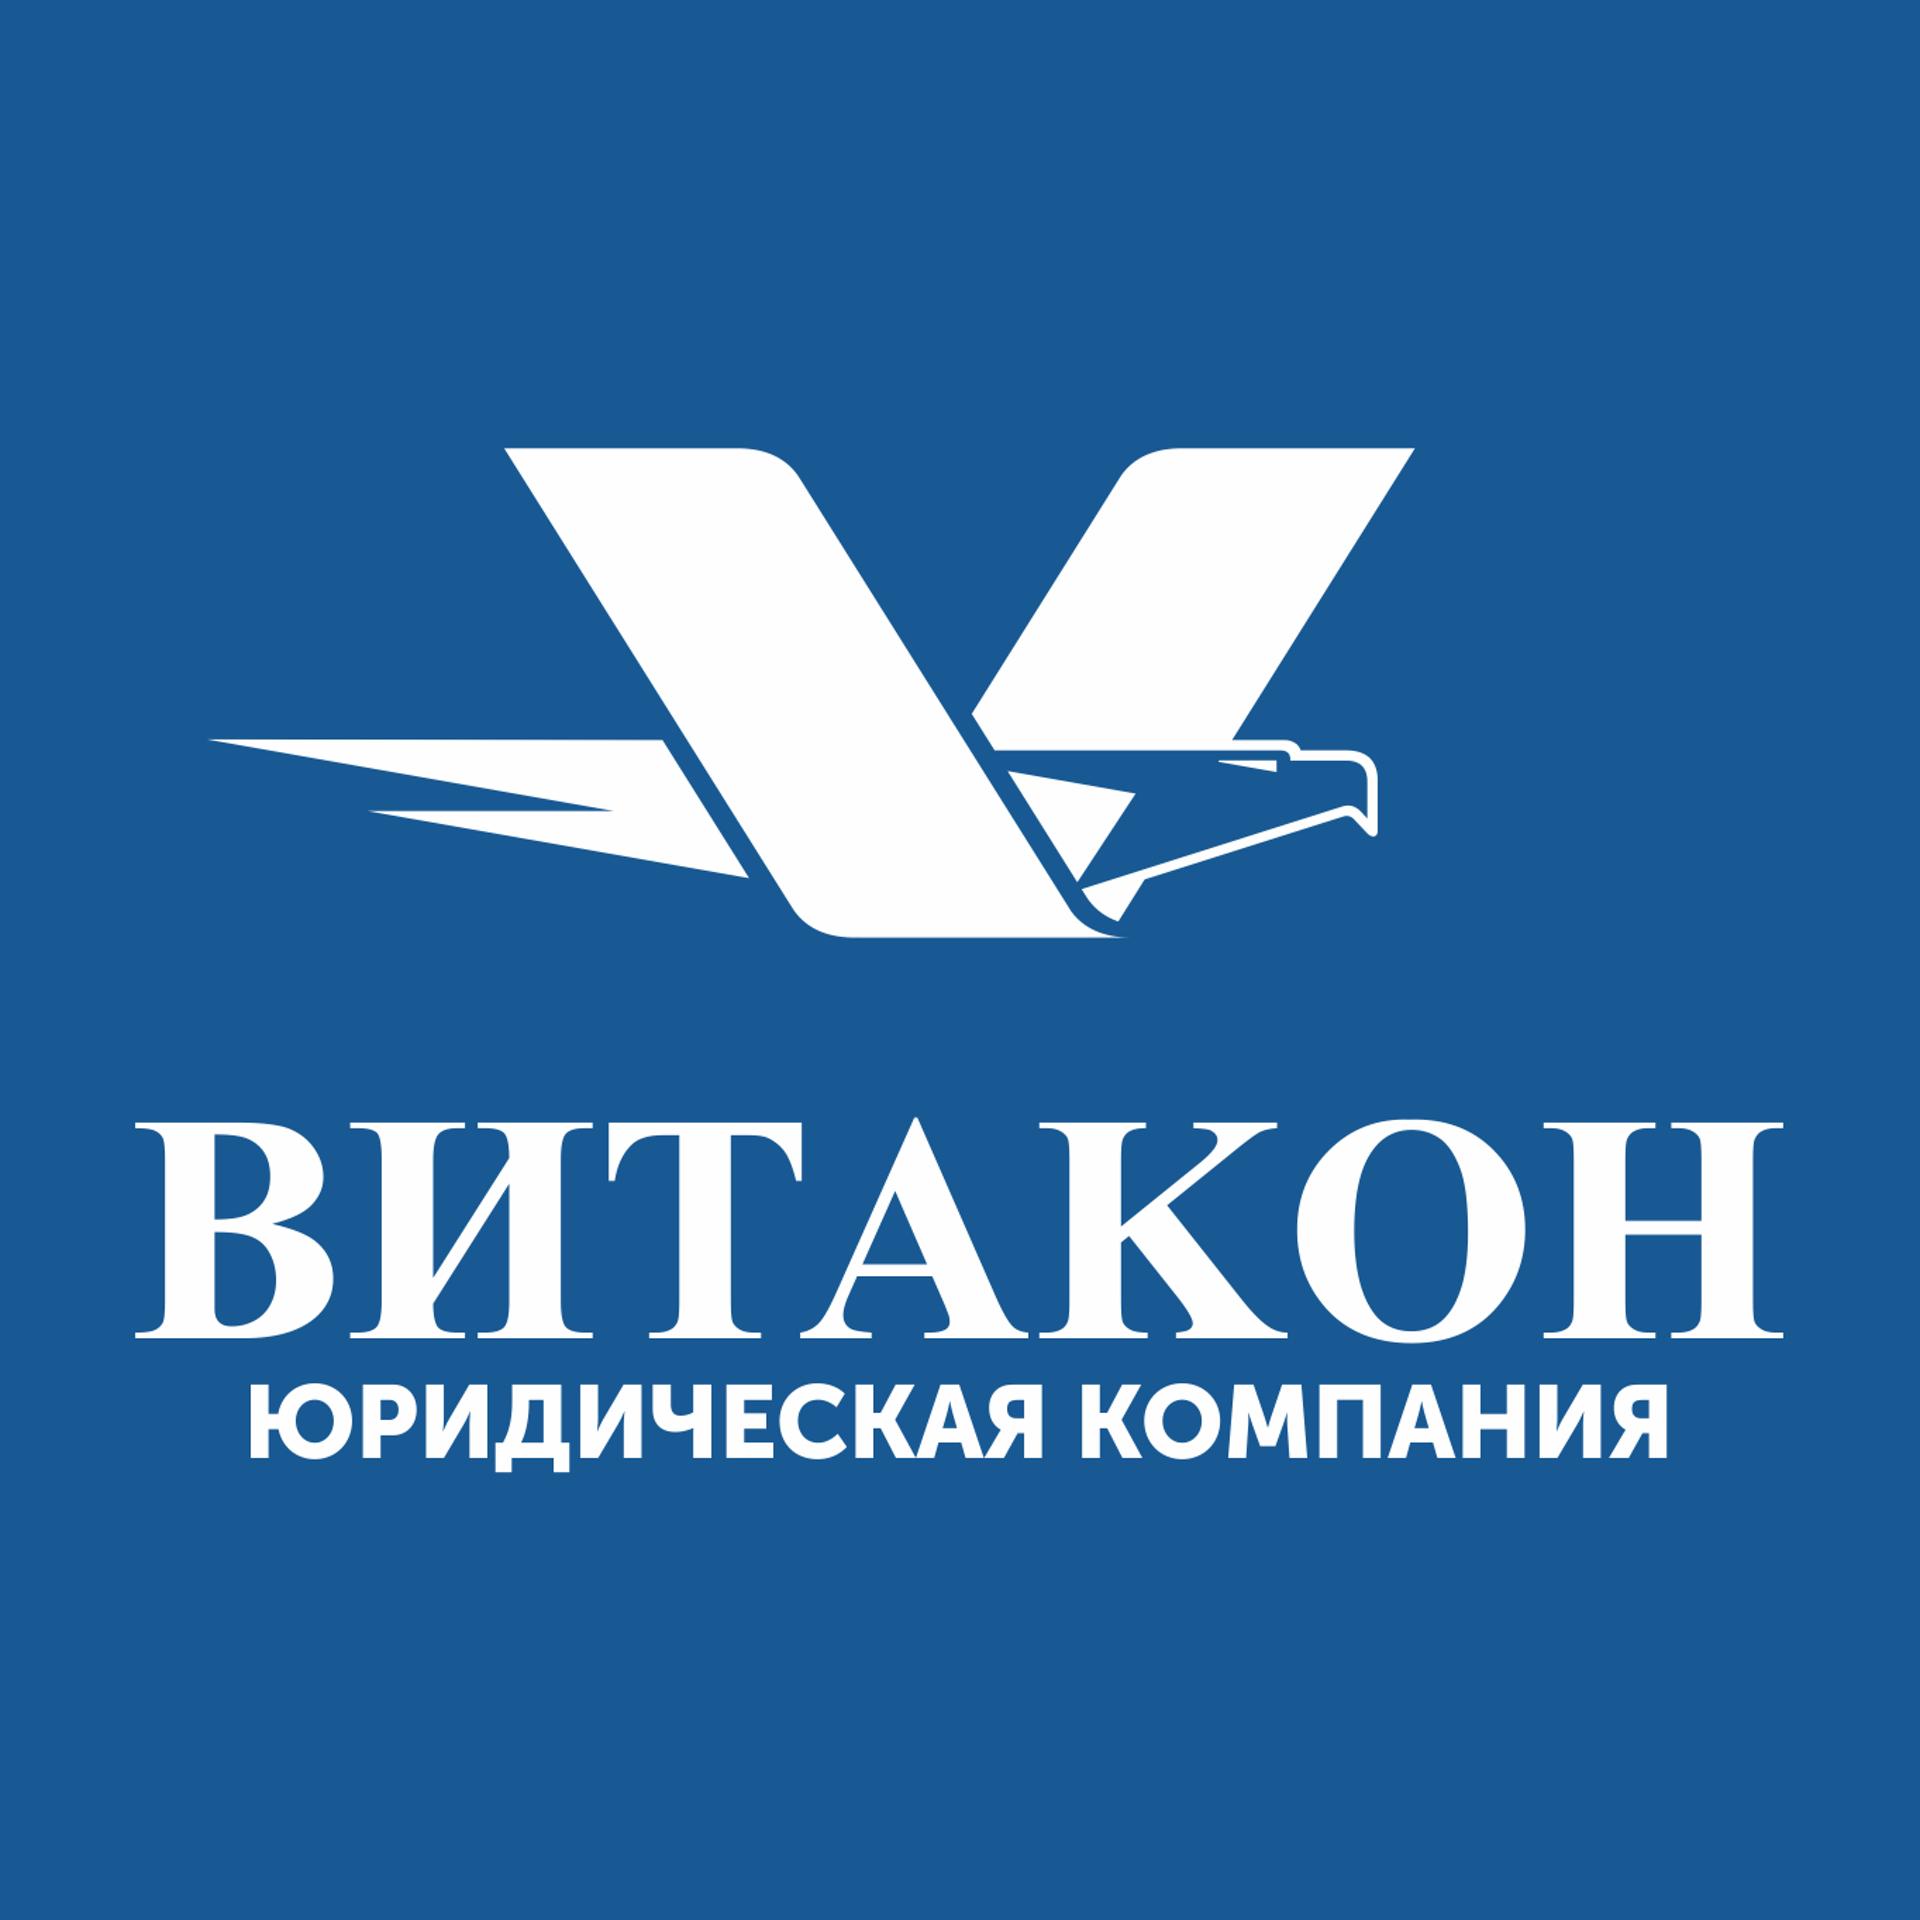 Кейс компании Витакон по поставке лидов на услуги банкротства физических лиц